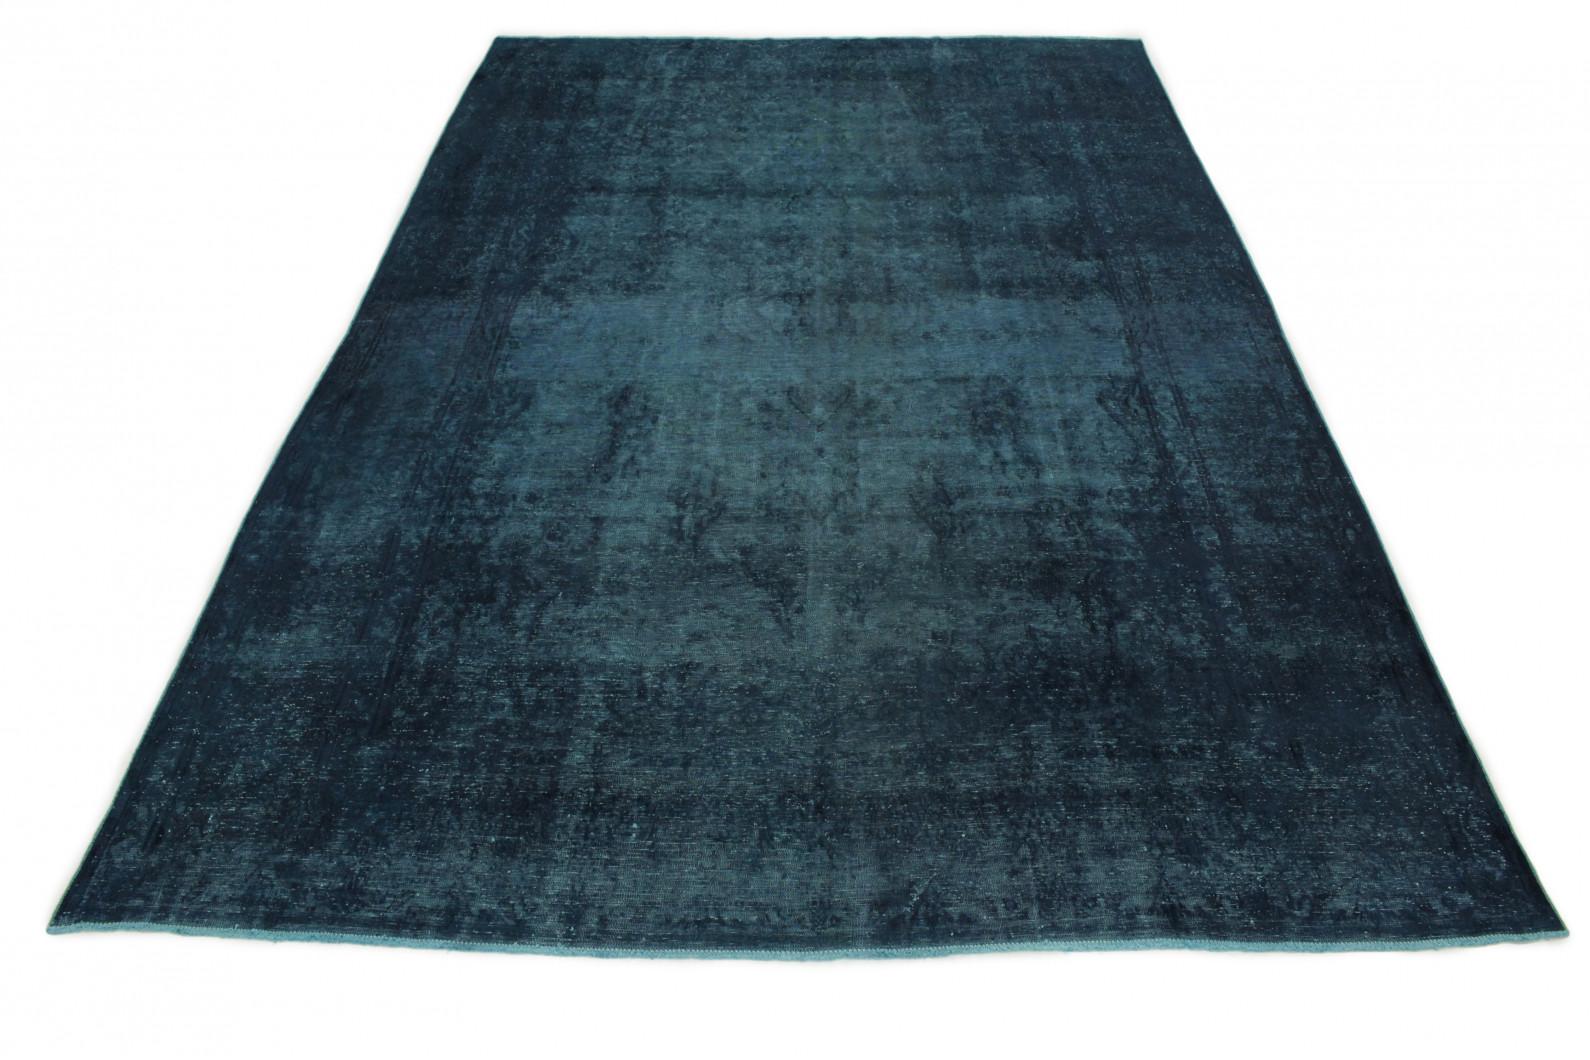 Vintage Teppich Blau in 440x290